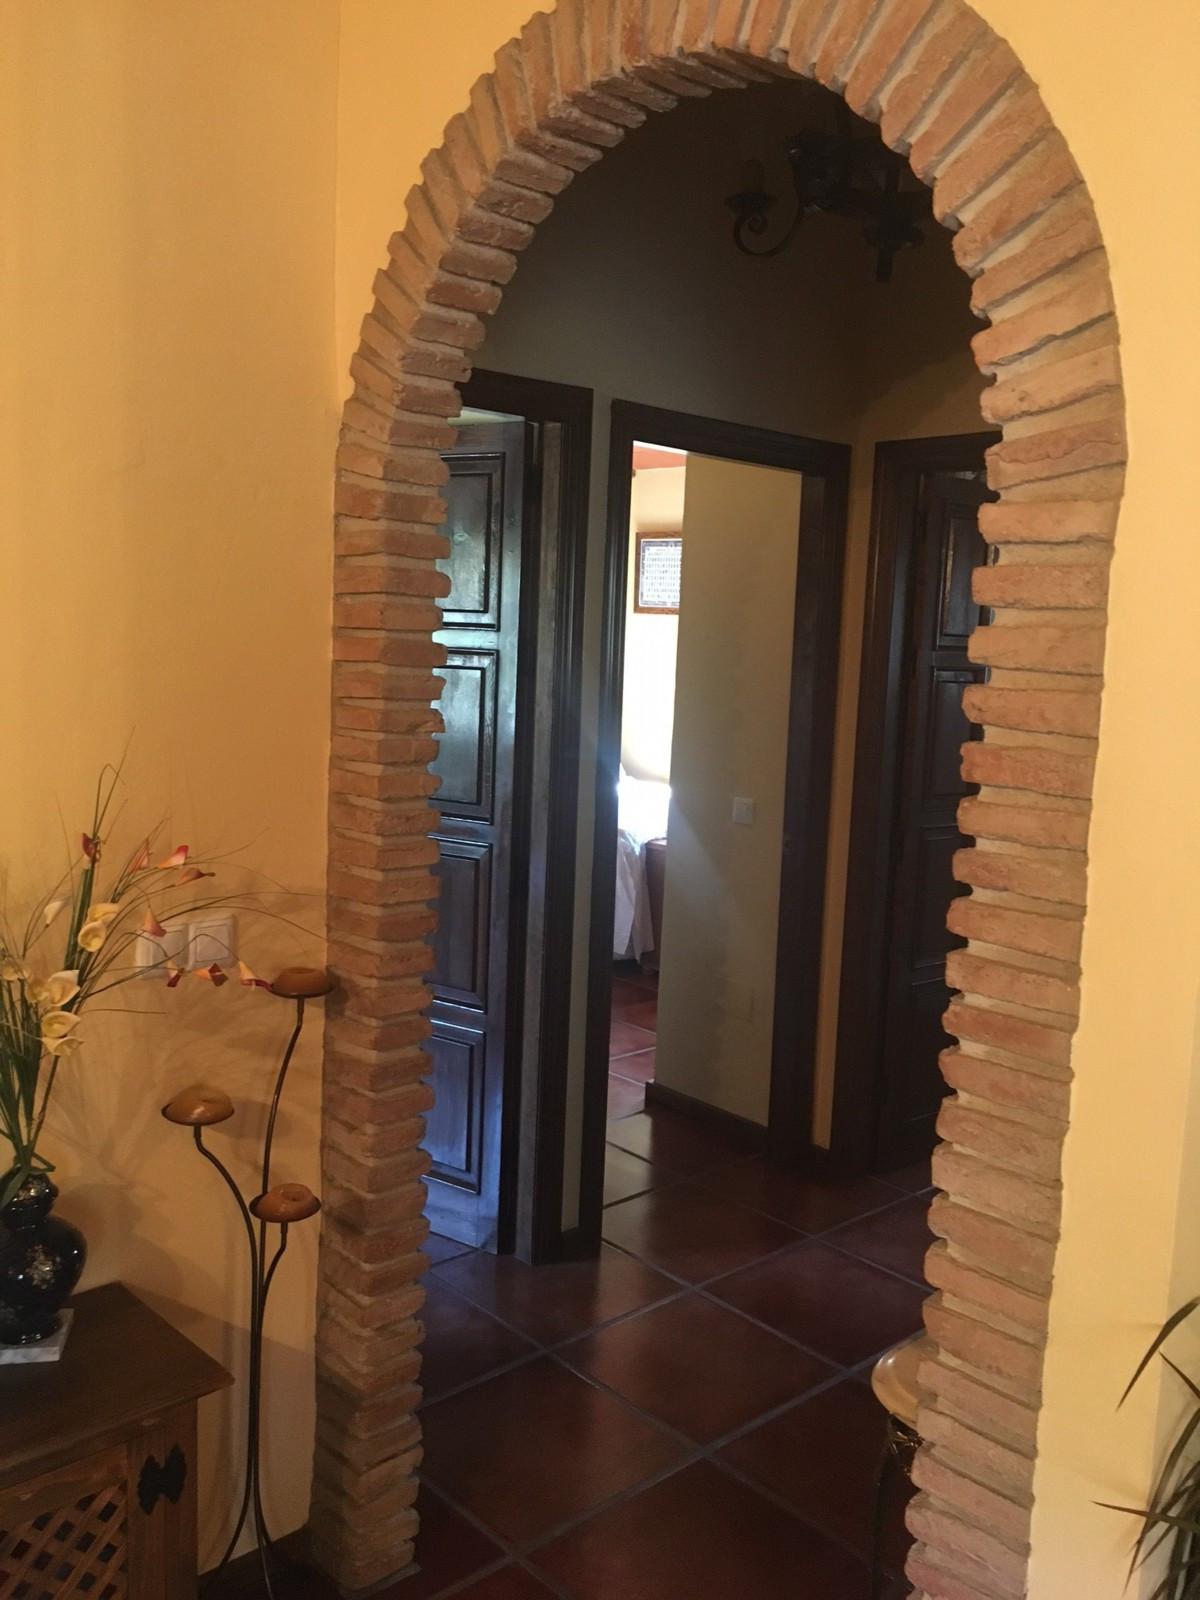 2 Bedroom Villa for sale Mijas Costa